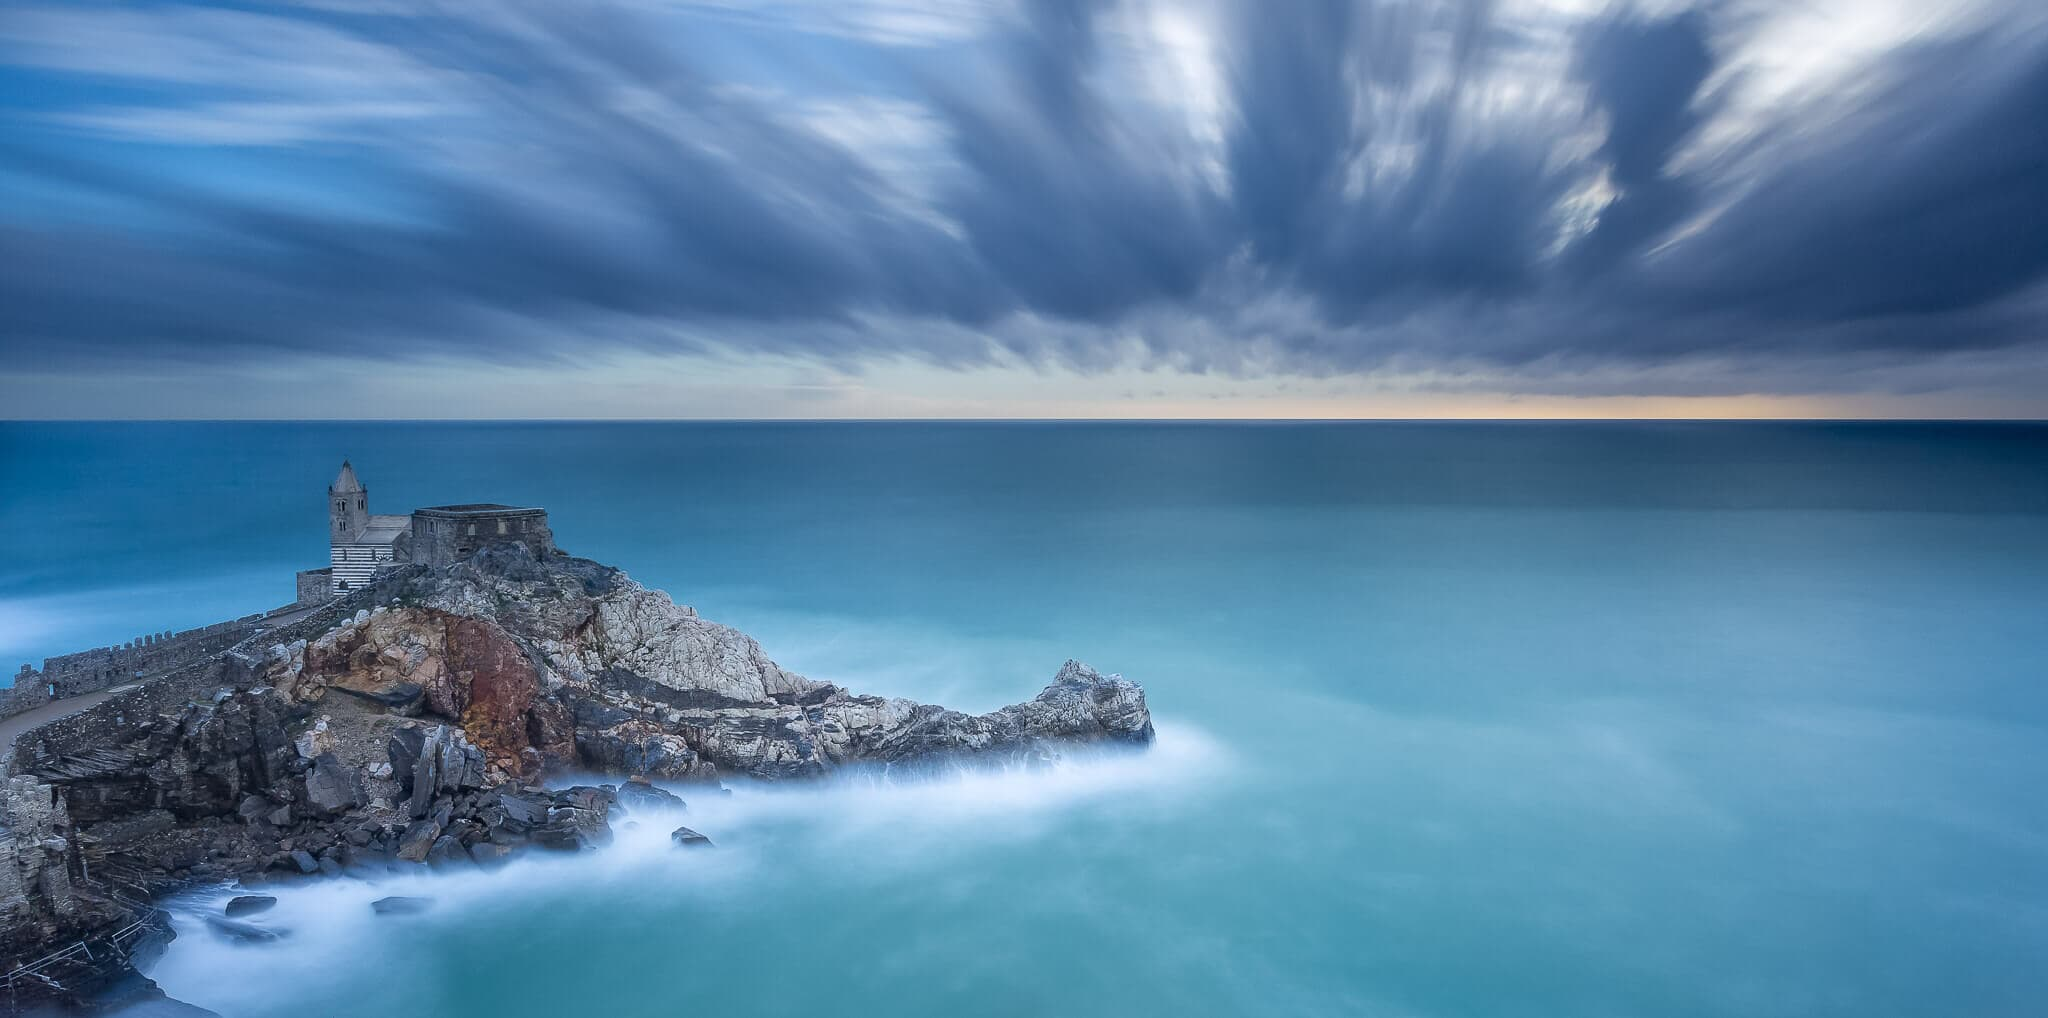 Francesco Gola Seascape Long Exposure Photography Website FineArt Prints Workshops Blog Landscape